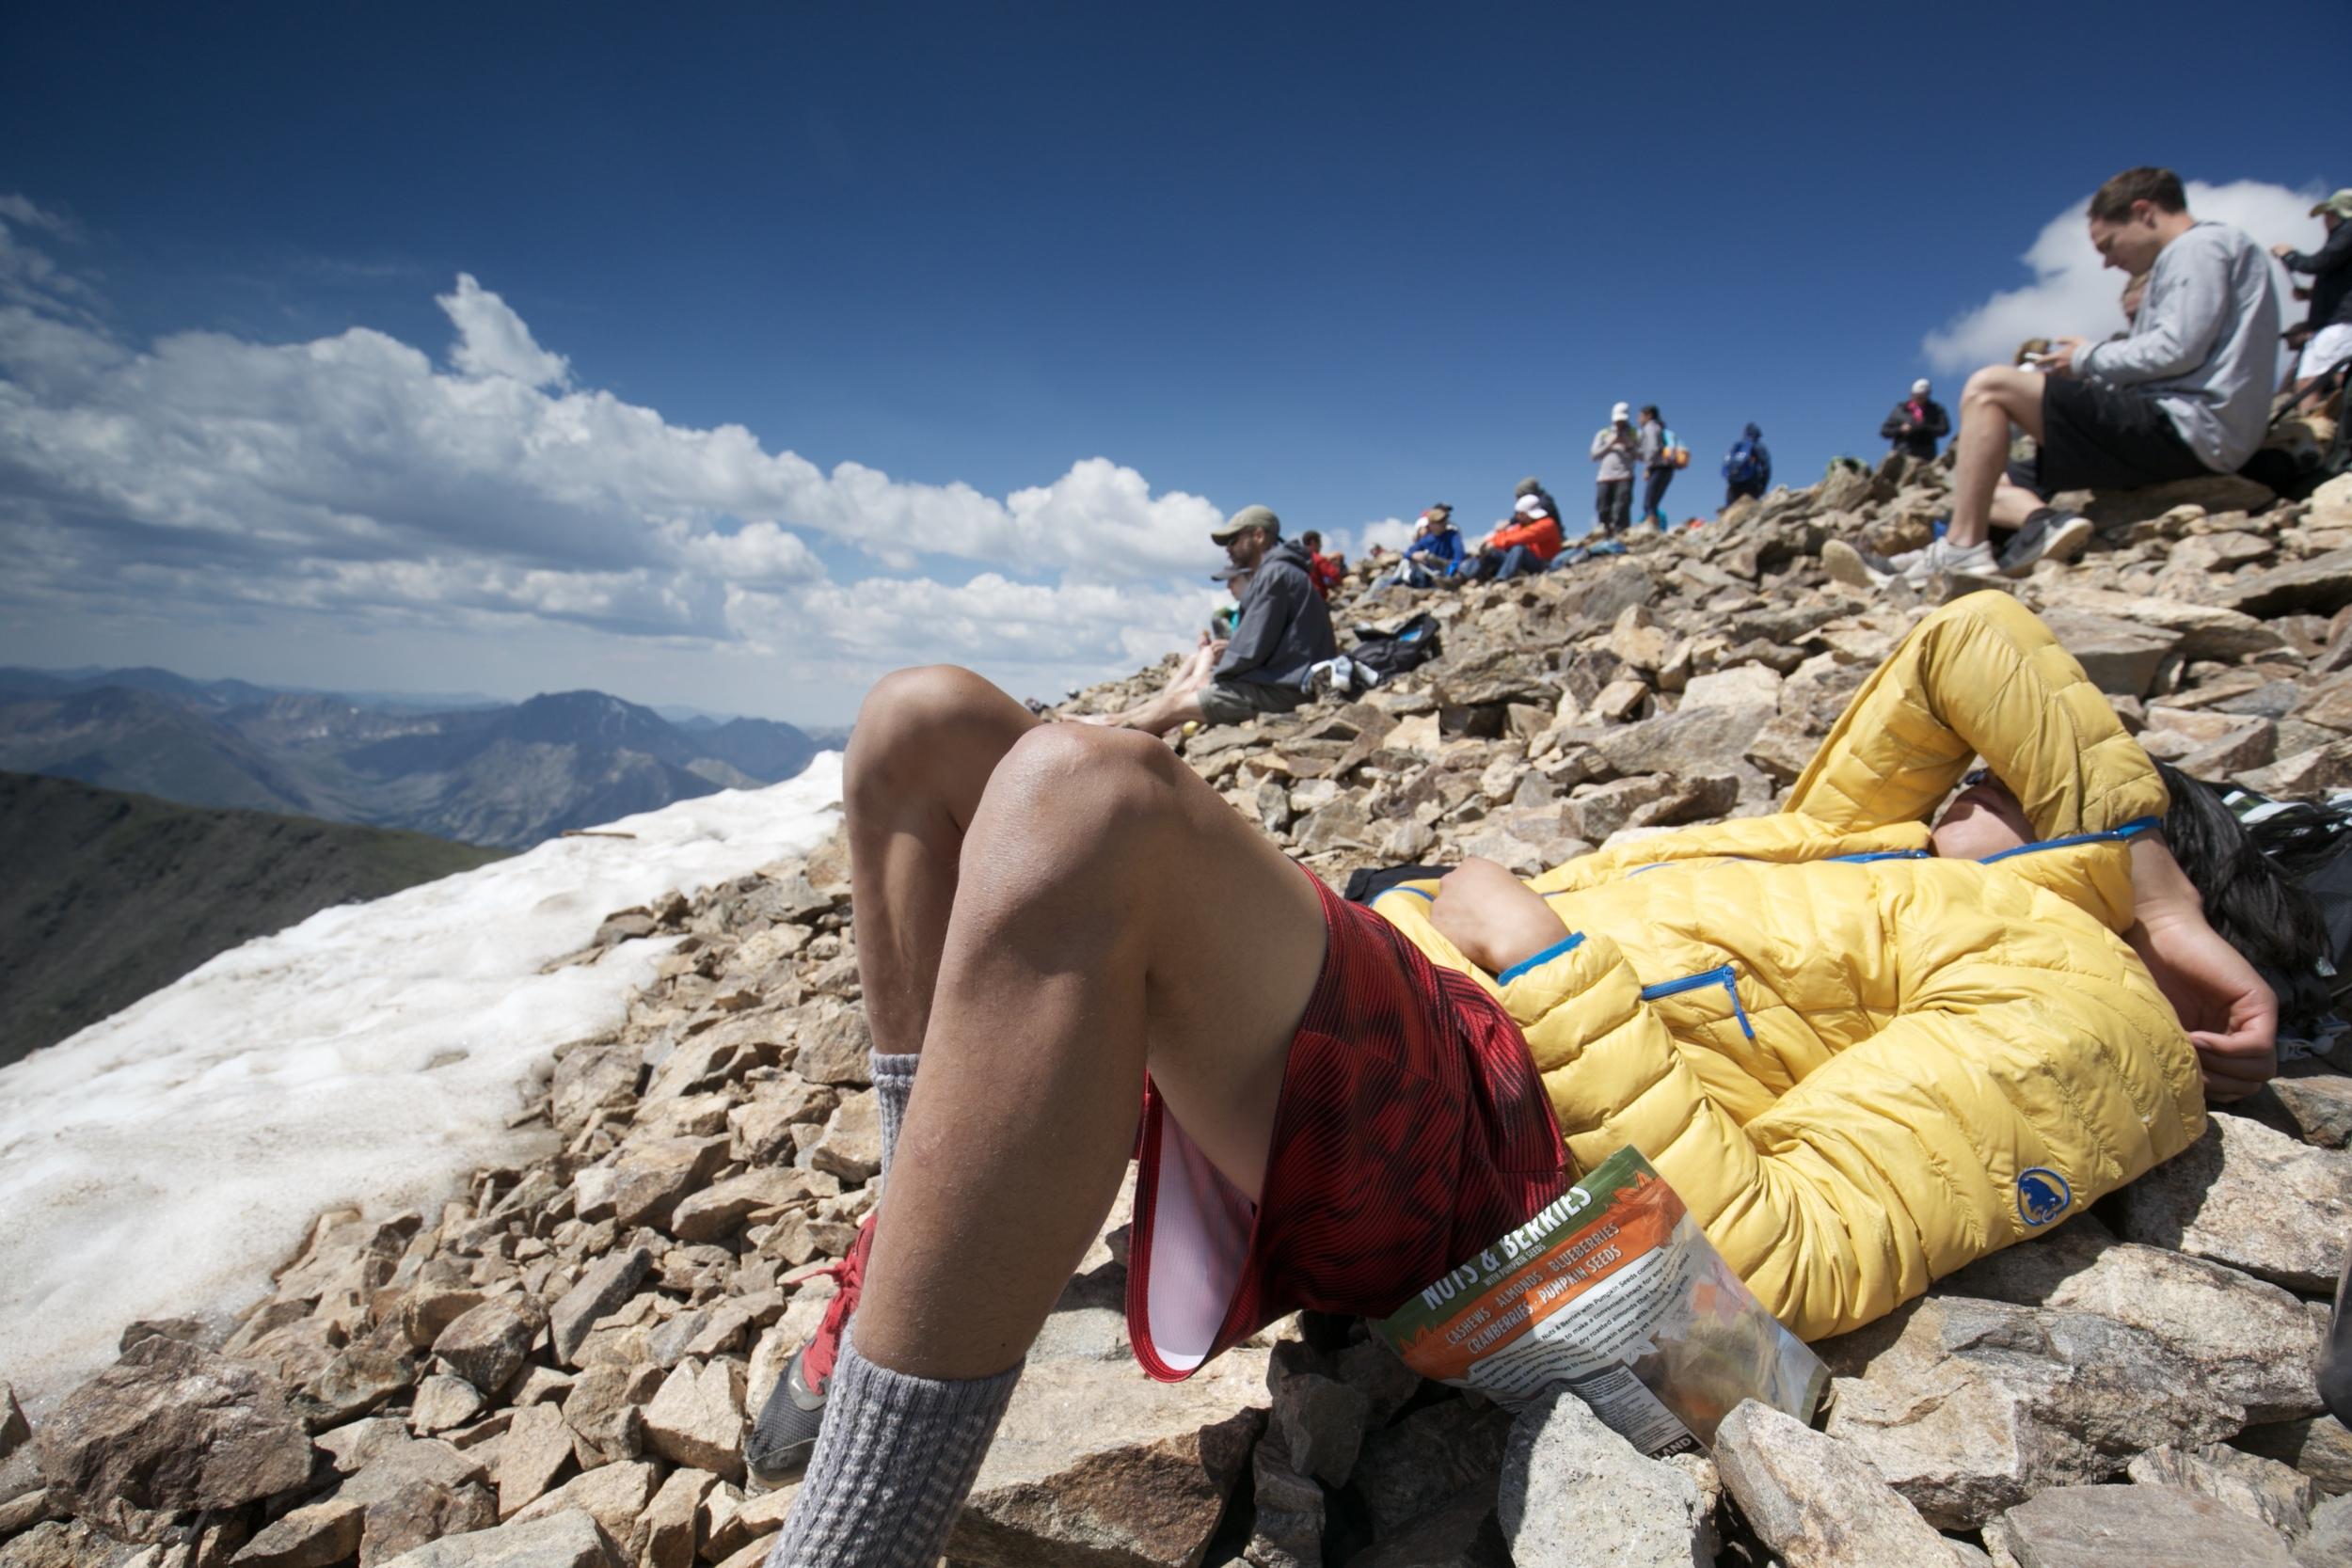 Resting at the top of Mount Elbert.